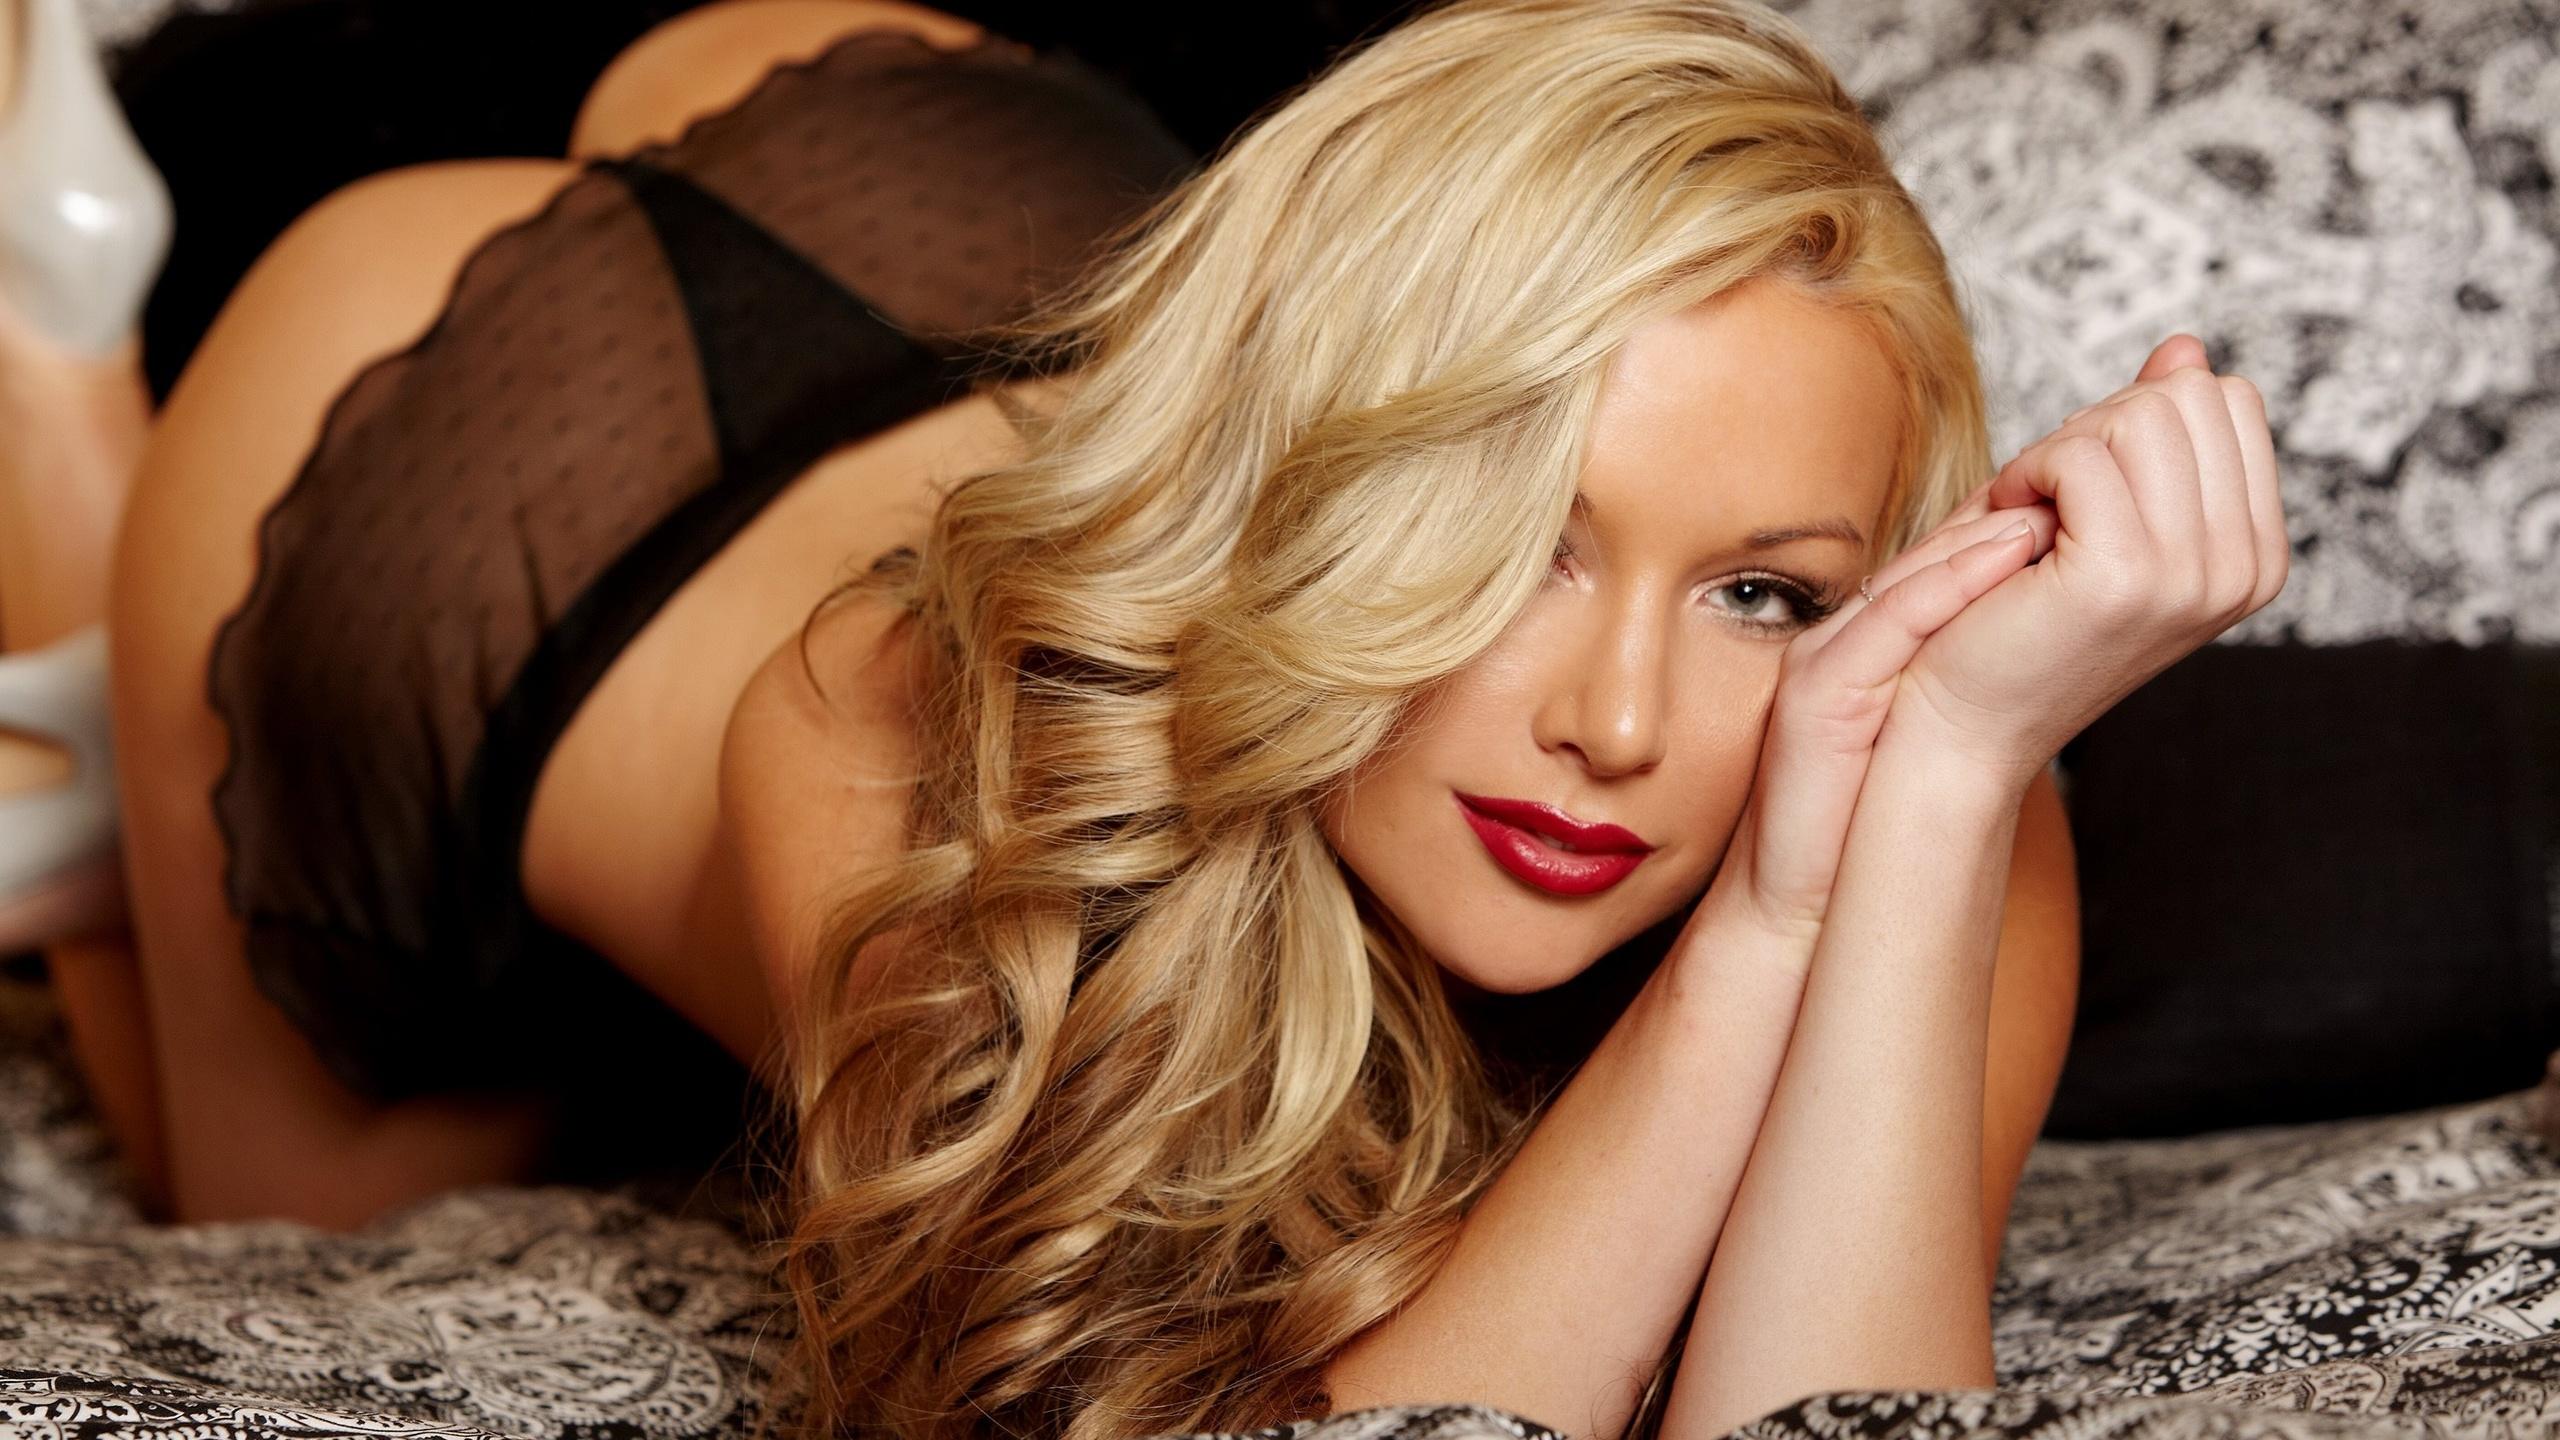 Kayden kross blonde sex st, jaoanese porn